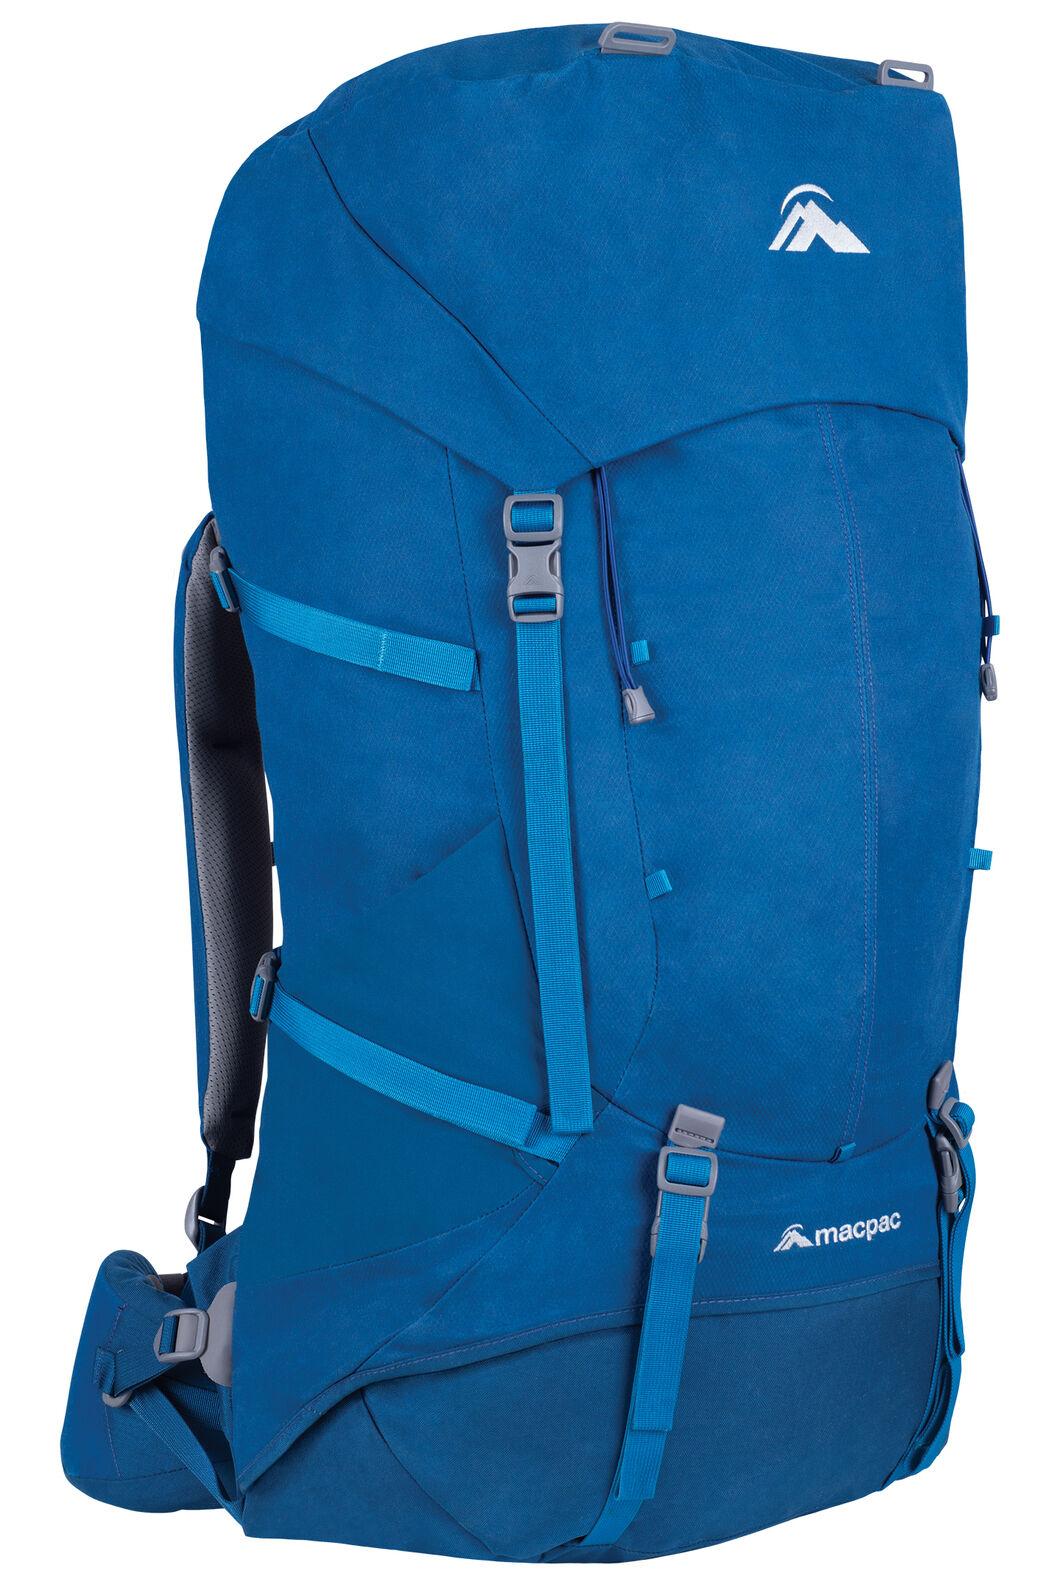 Macpac Cascade 75L AzTec® Hiking Pack, Poseidon, hi-res